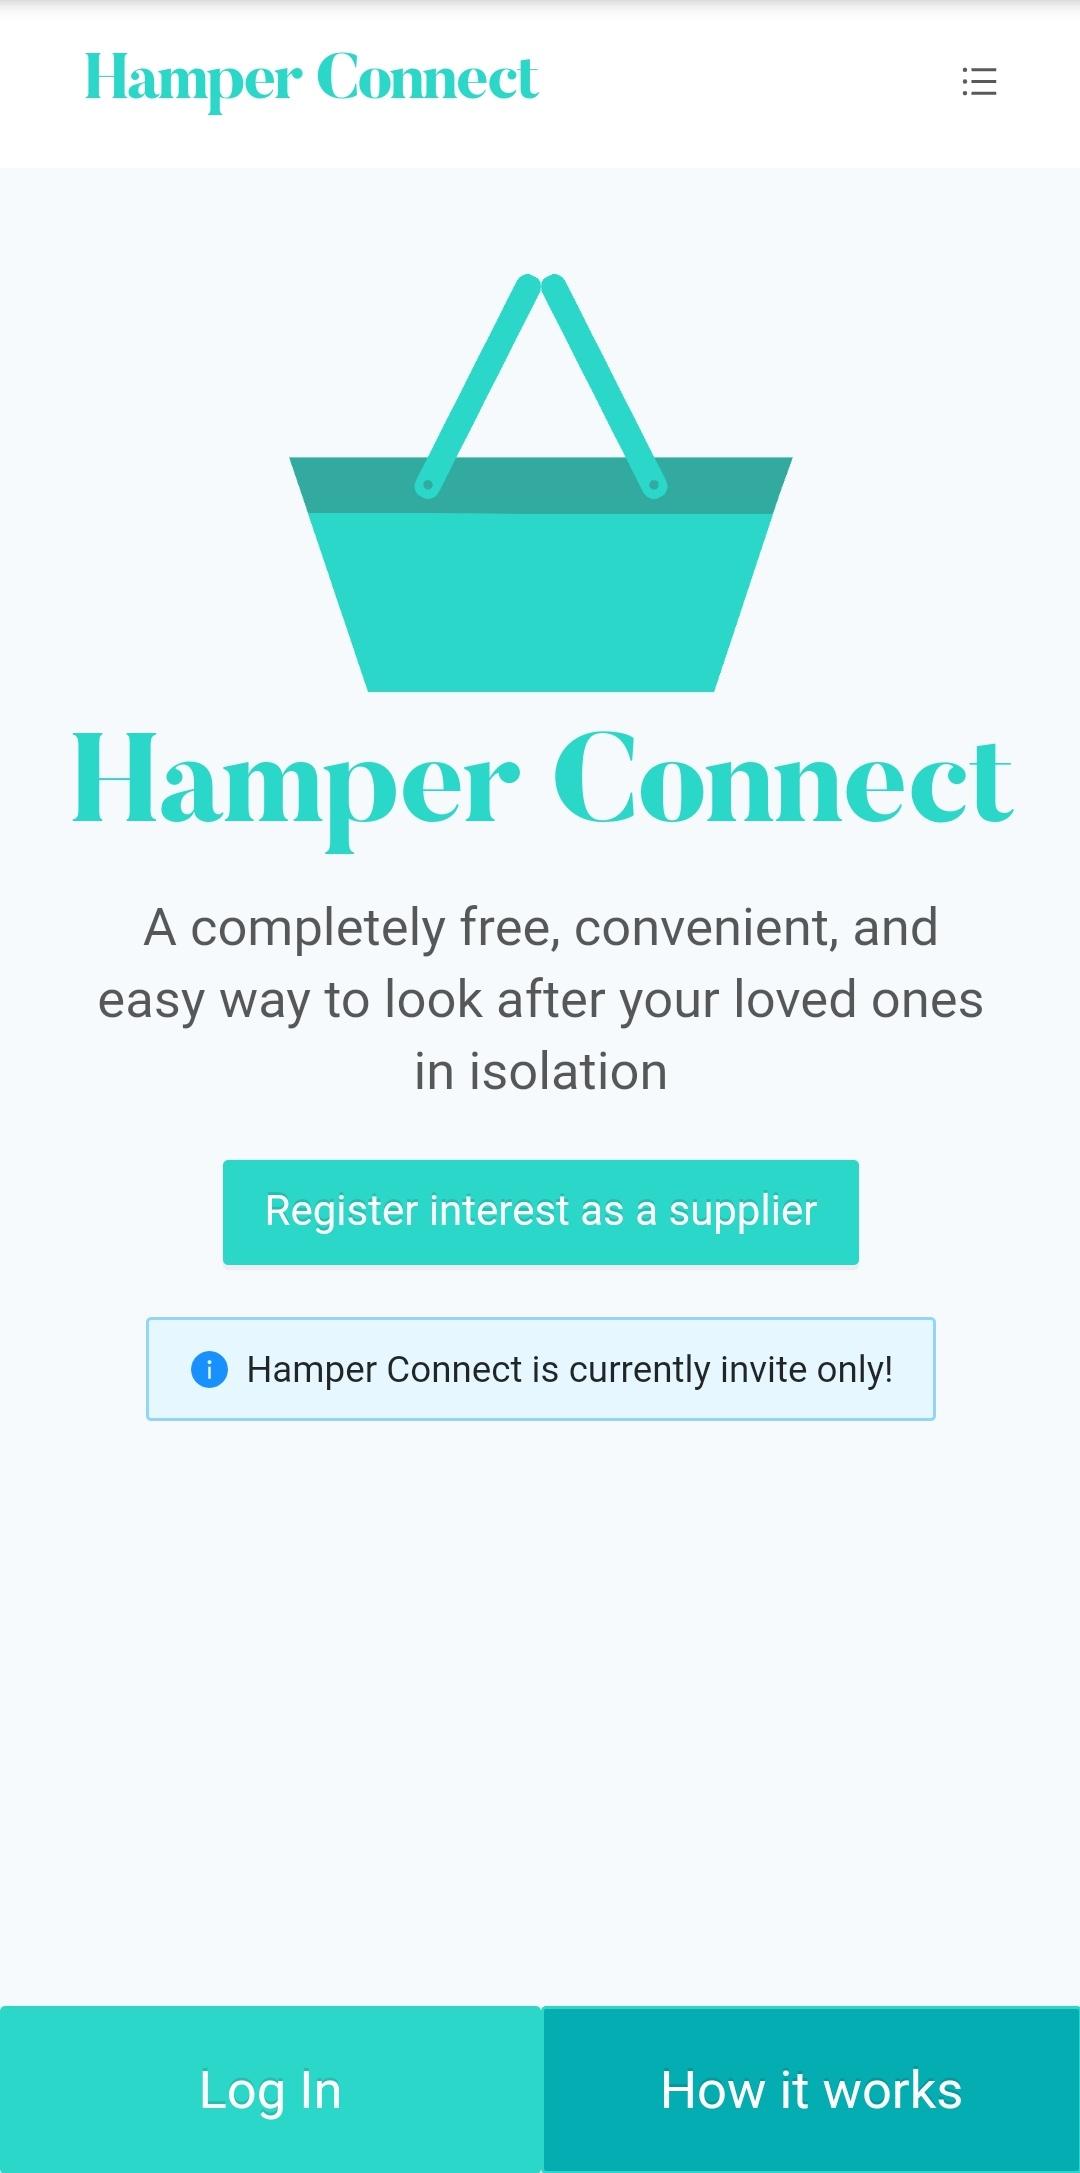 Hamper Connect